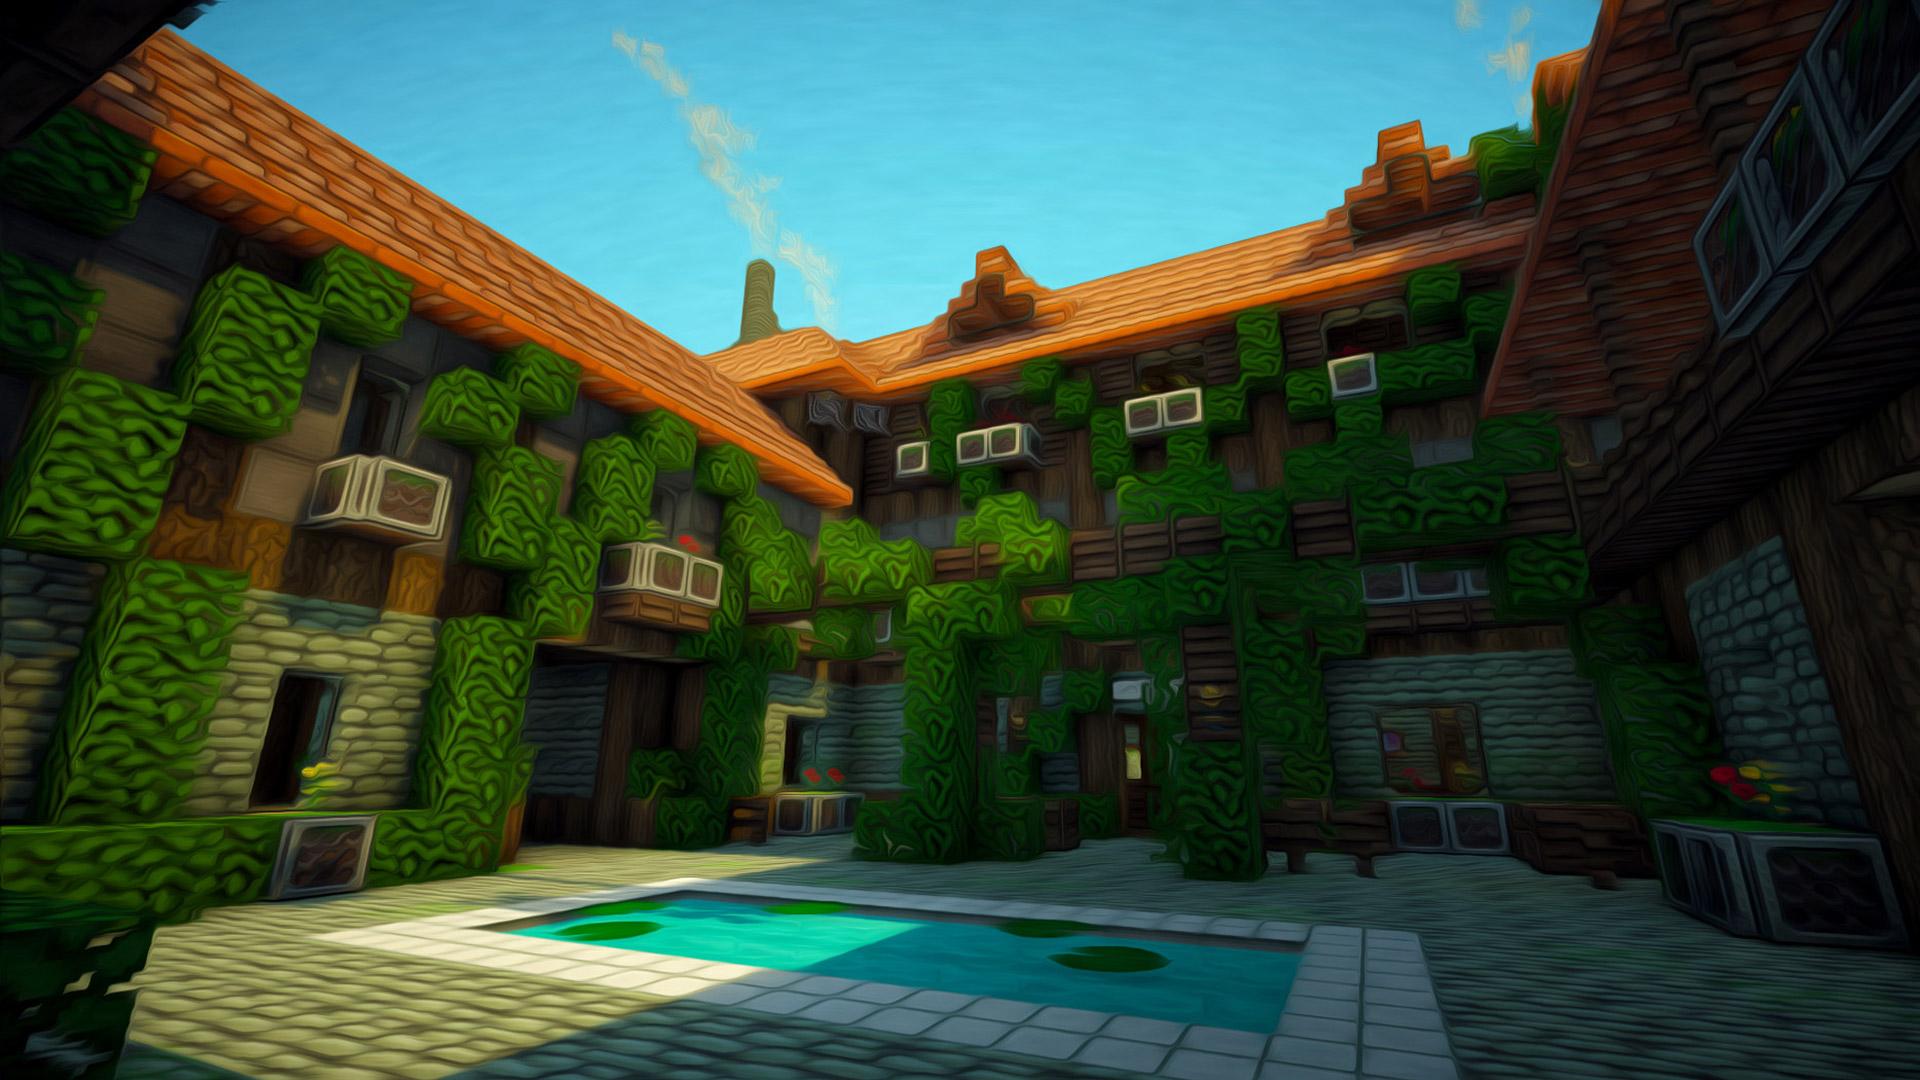 Minecraft Wallpaper 46707 1920x1080px 1920x1080